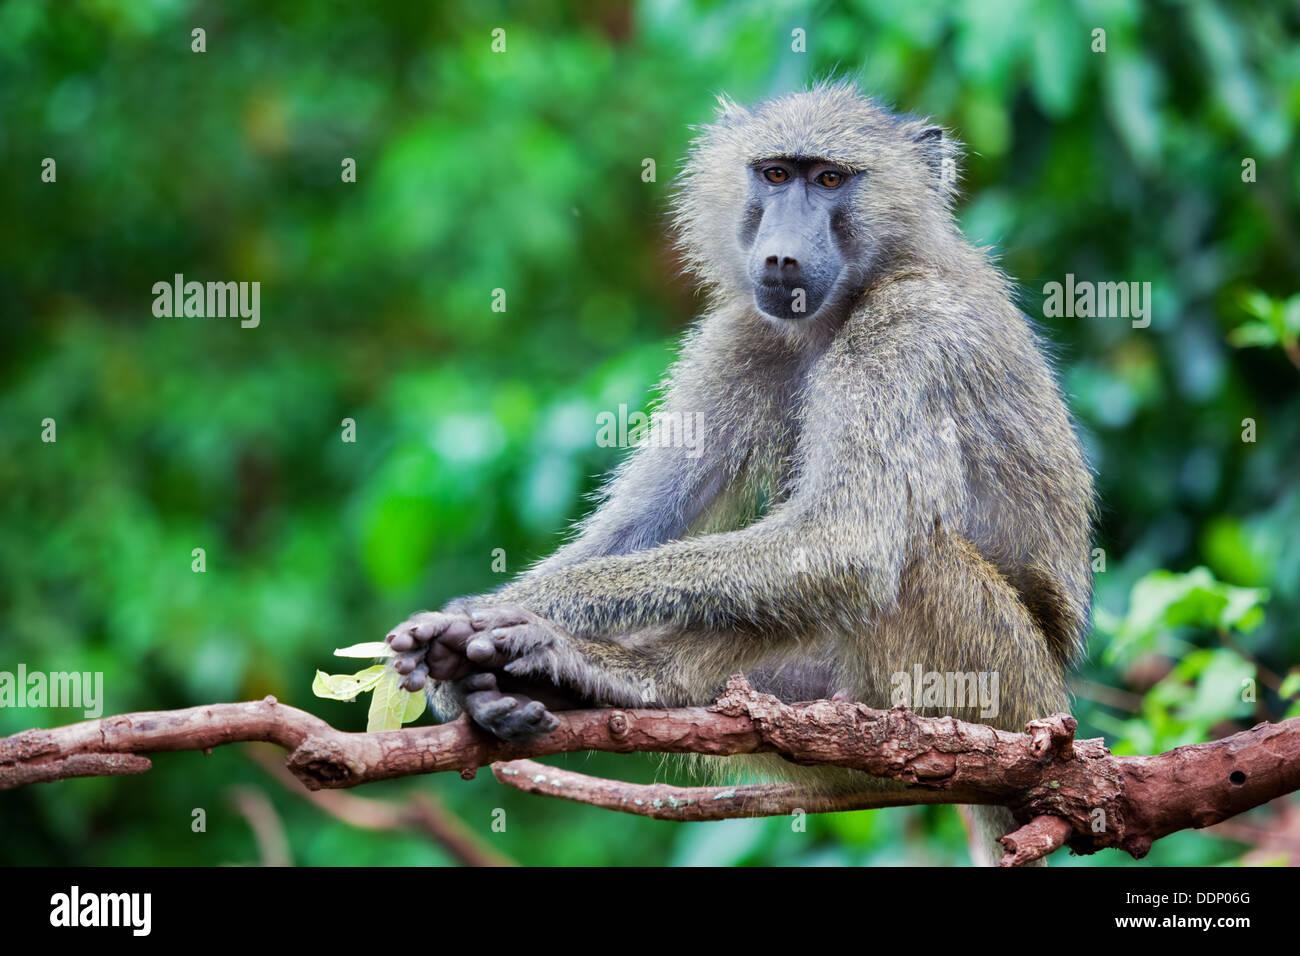 Baboon monkey in African bush. Lake Manyara National Park in Tanzania - Stock Image